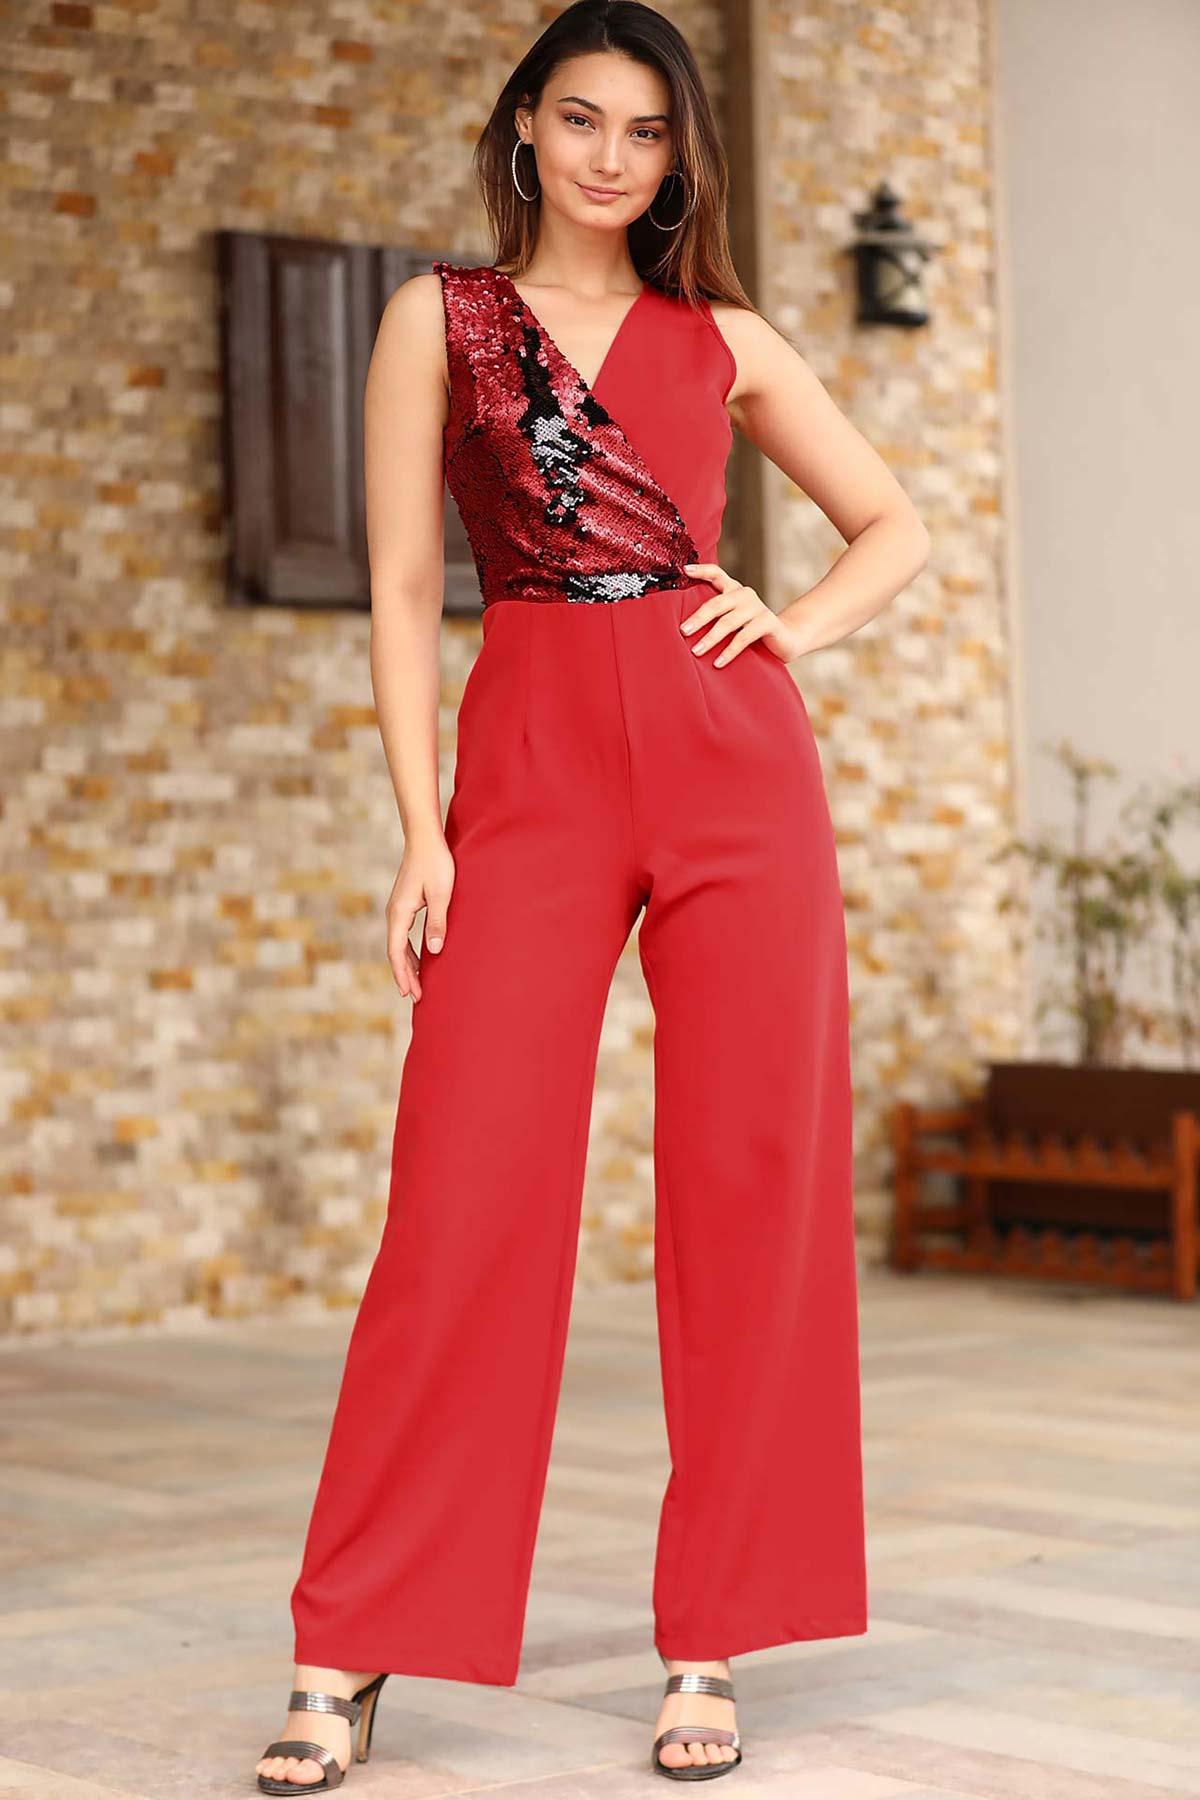 Women's Sequin Top Red Overall